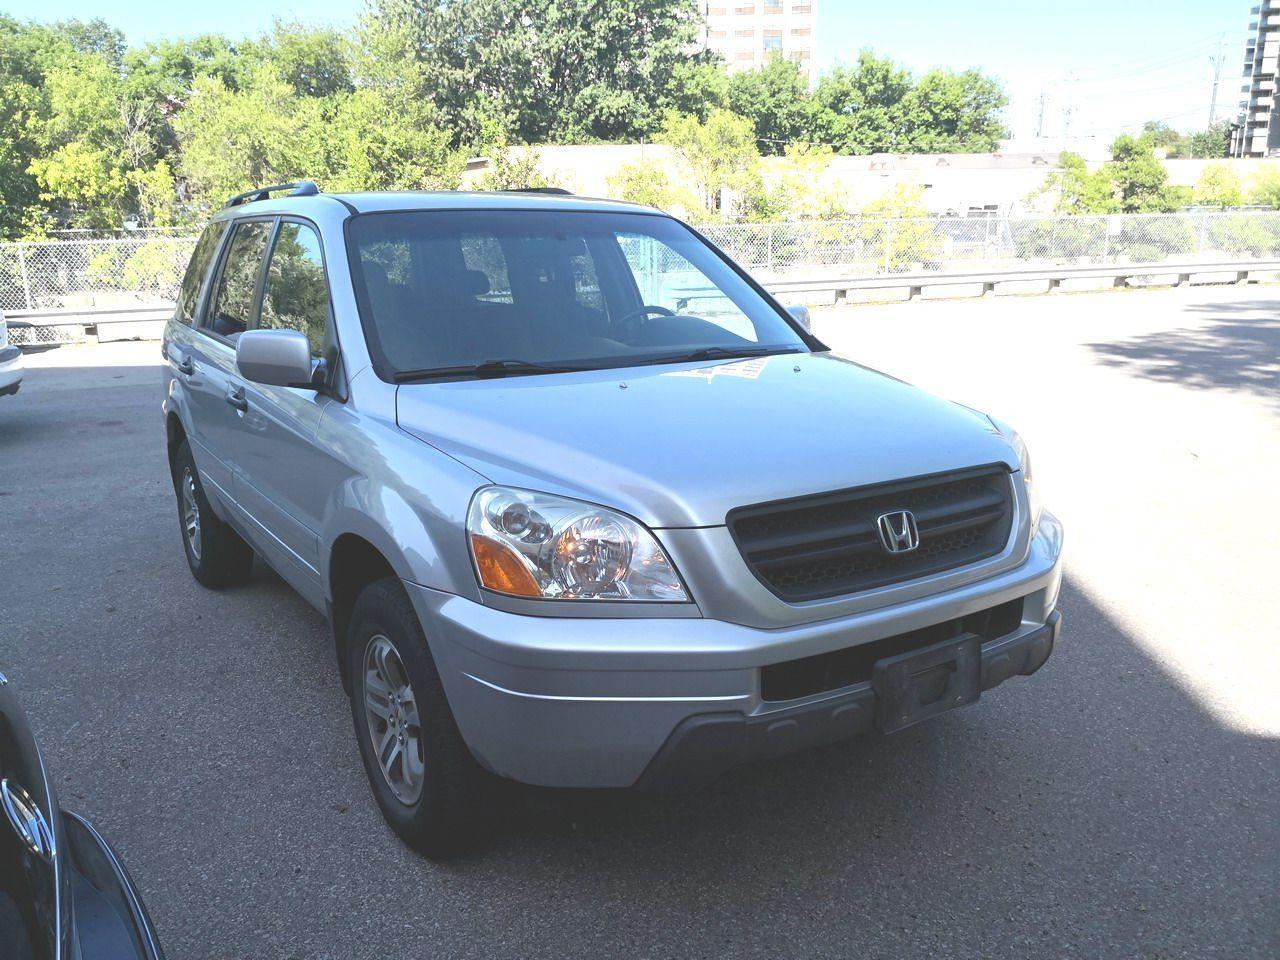 Photo of Silver 2005 Honda Pilot